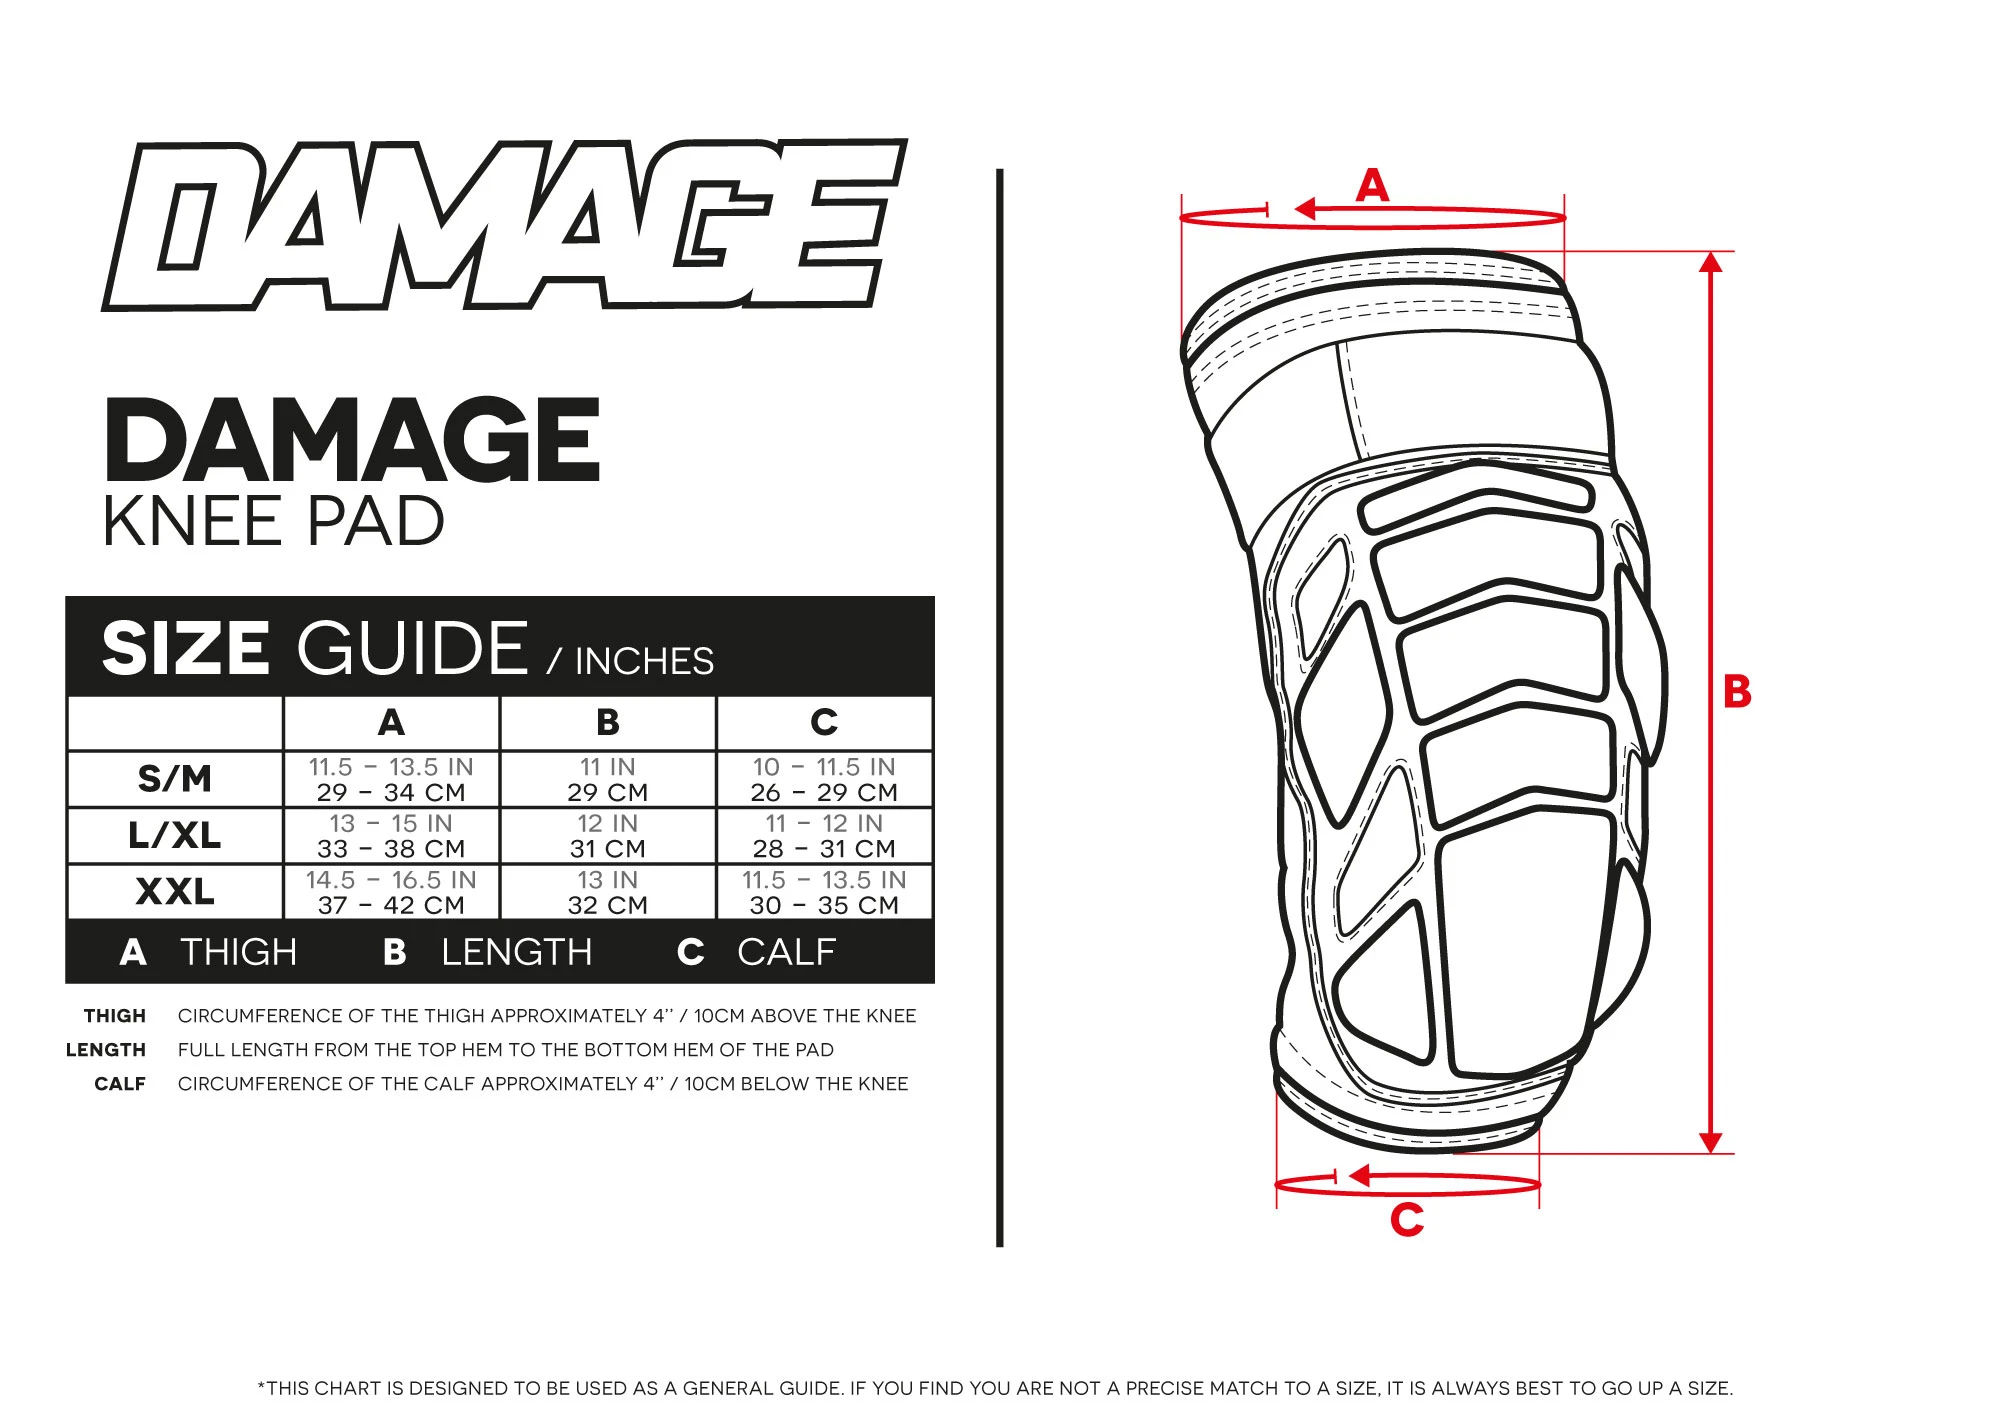 Damage Knee Pad